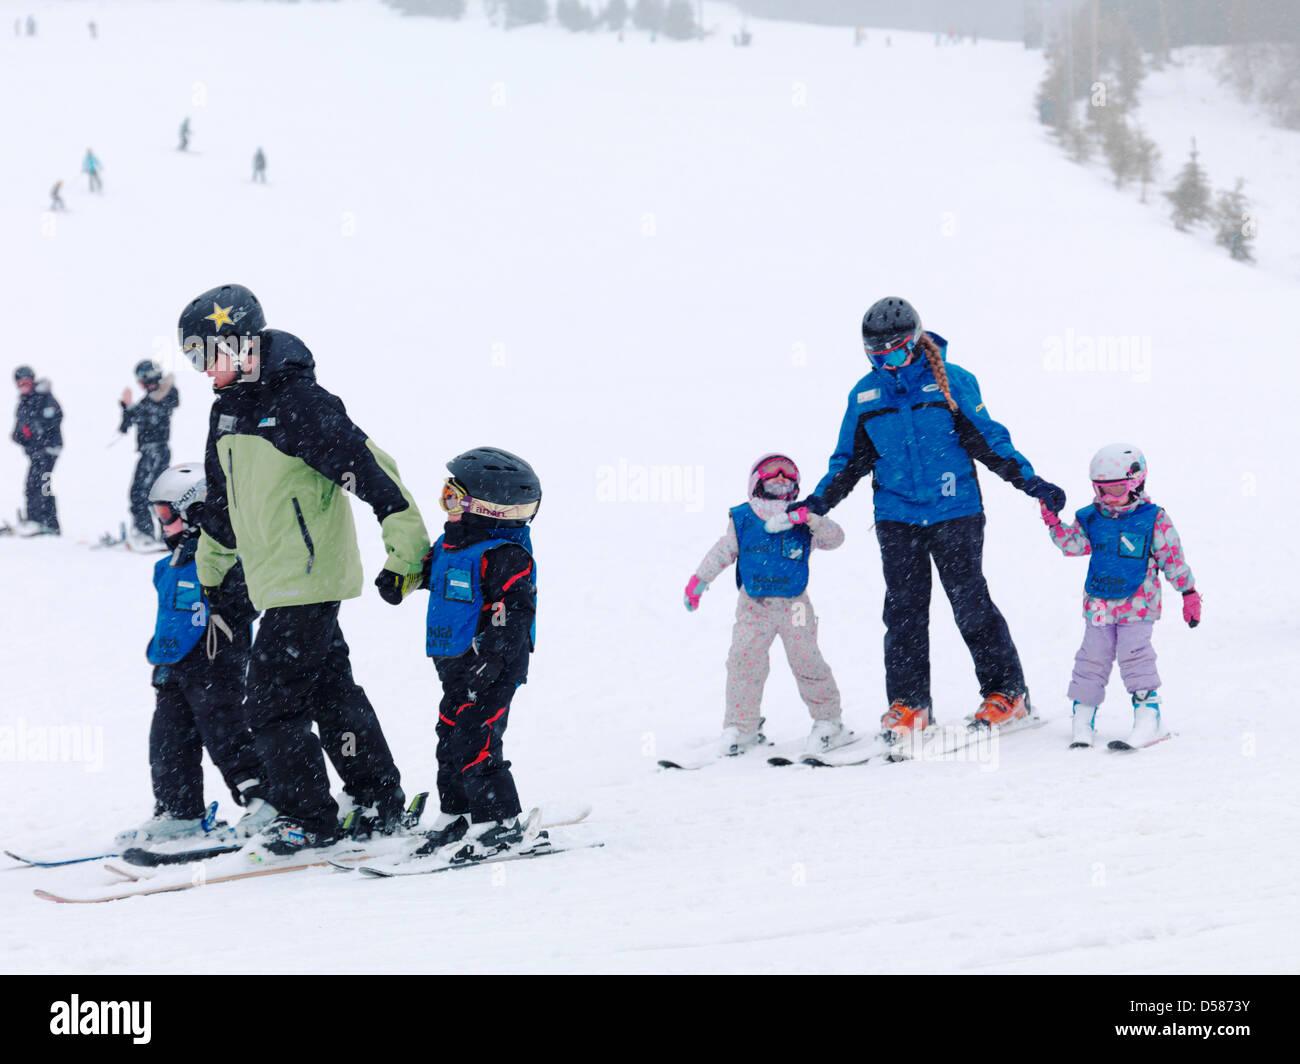 Children learning skiing at Blue Mountain, Collingwood, Ontario, Canada alpine ski resort. - Stock Image